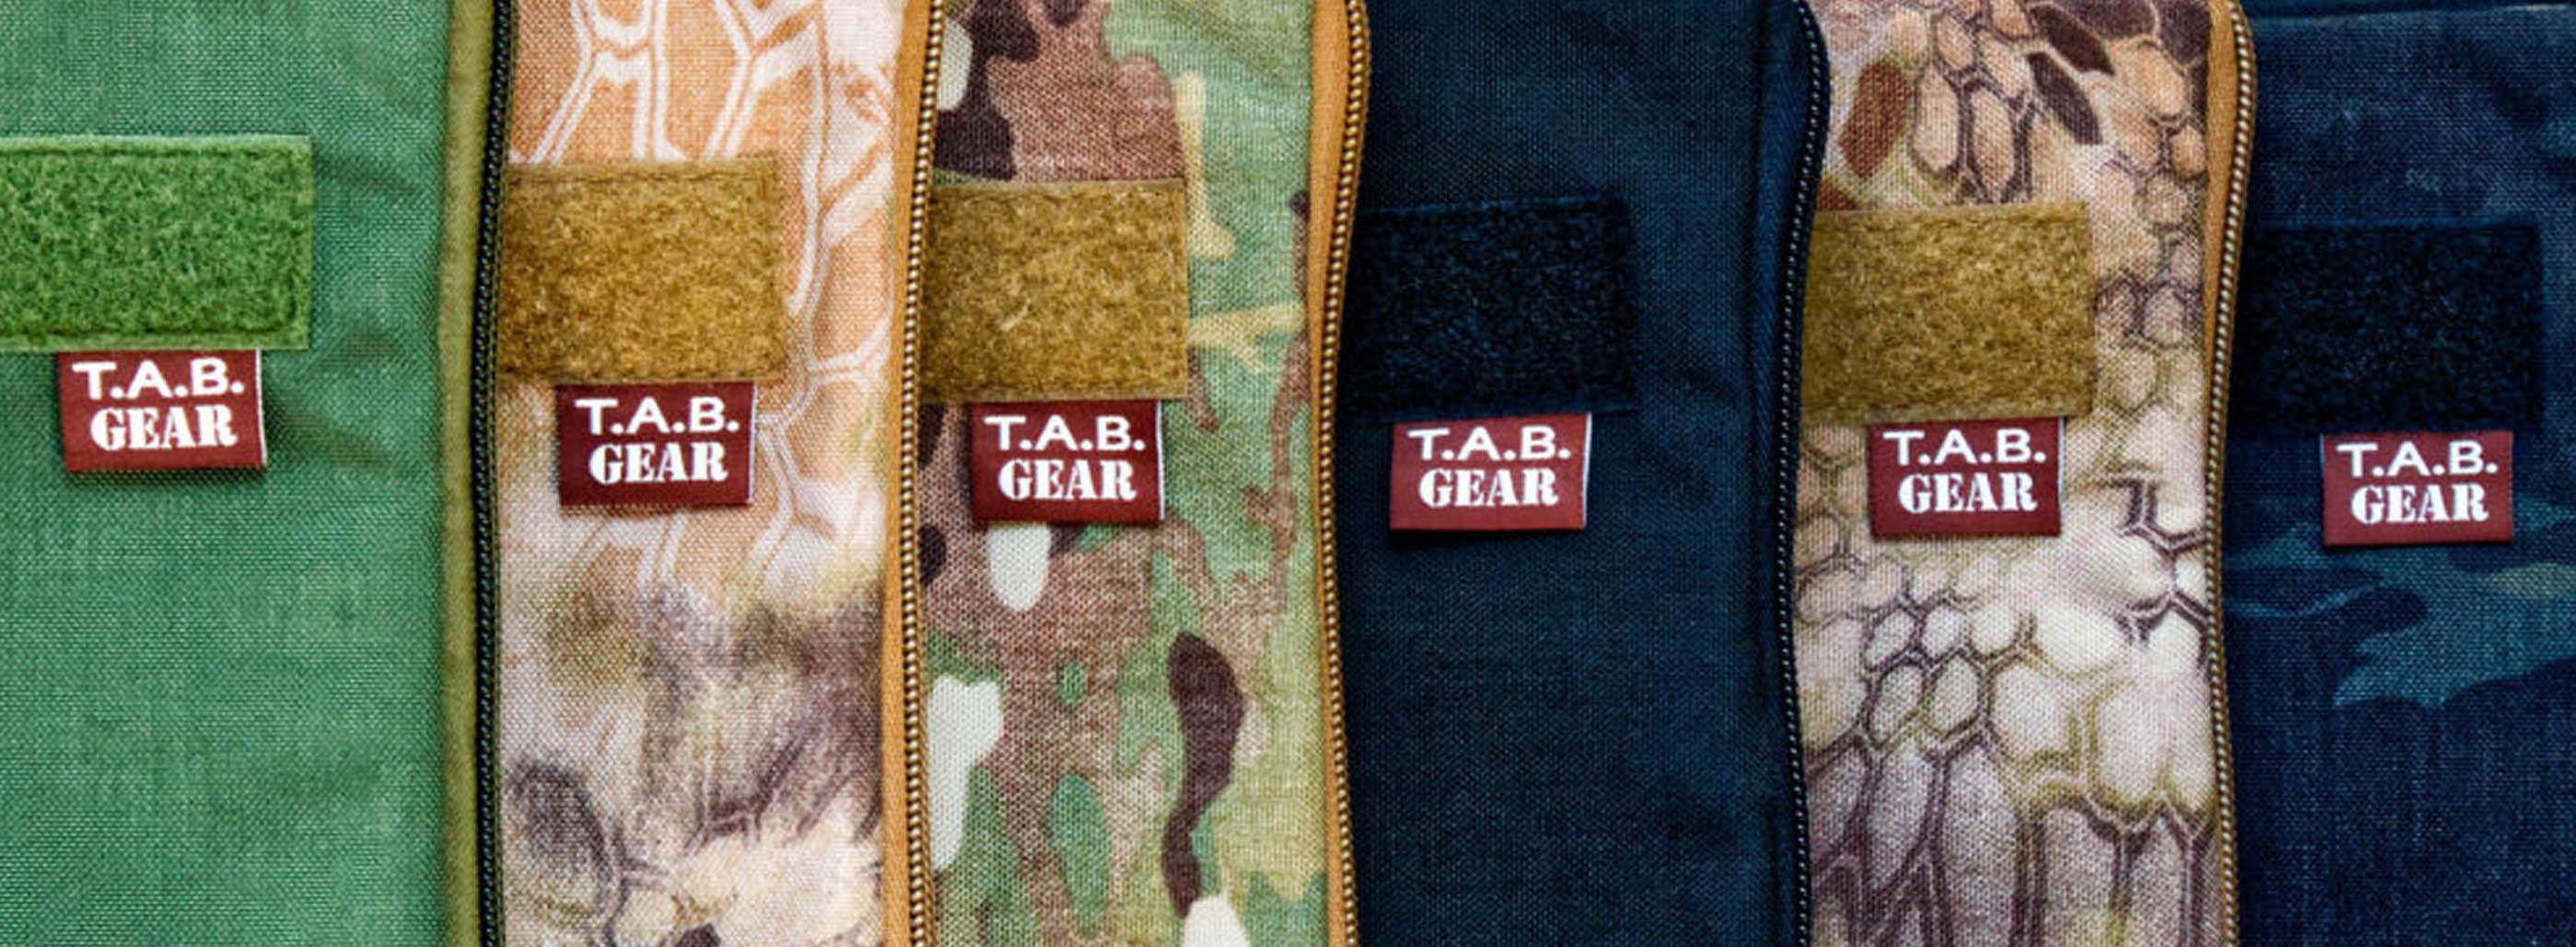 TAB_Gear